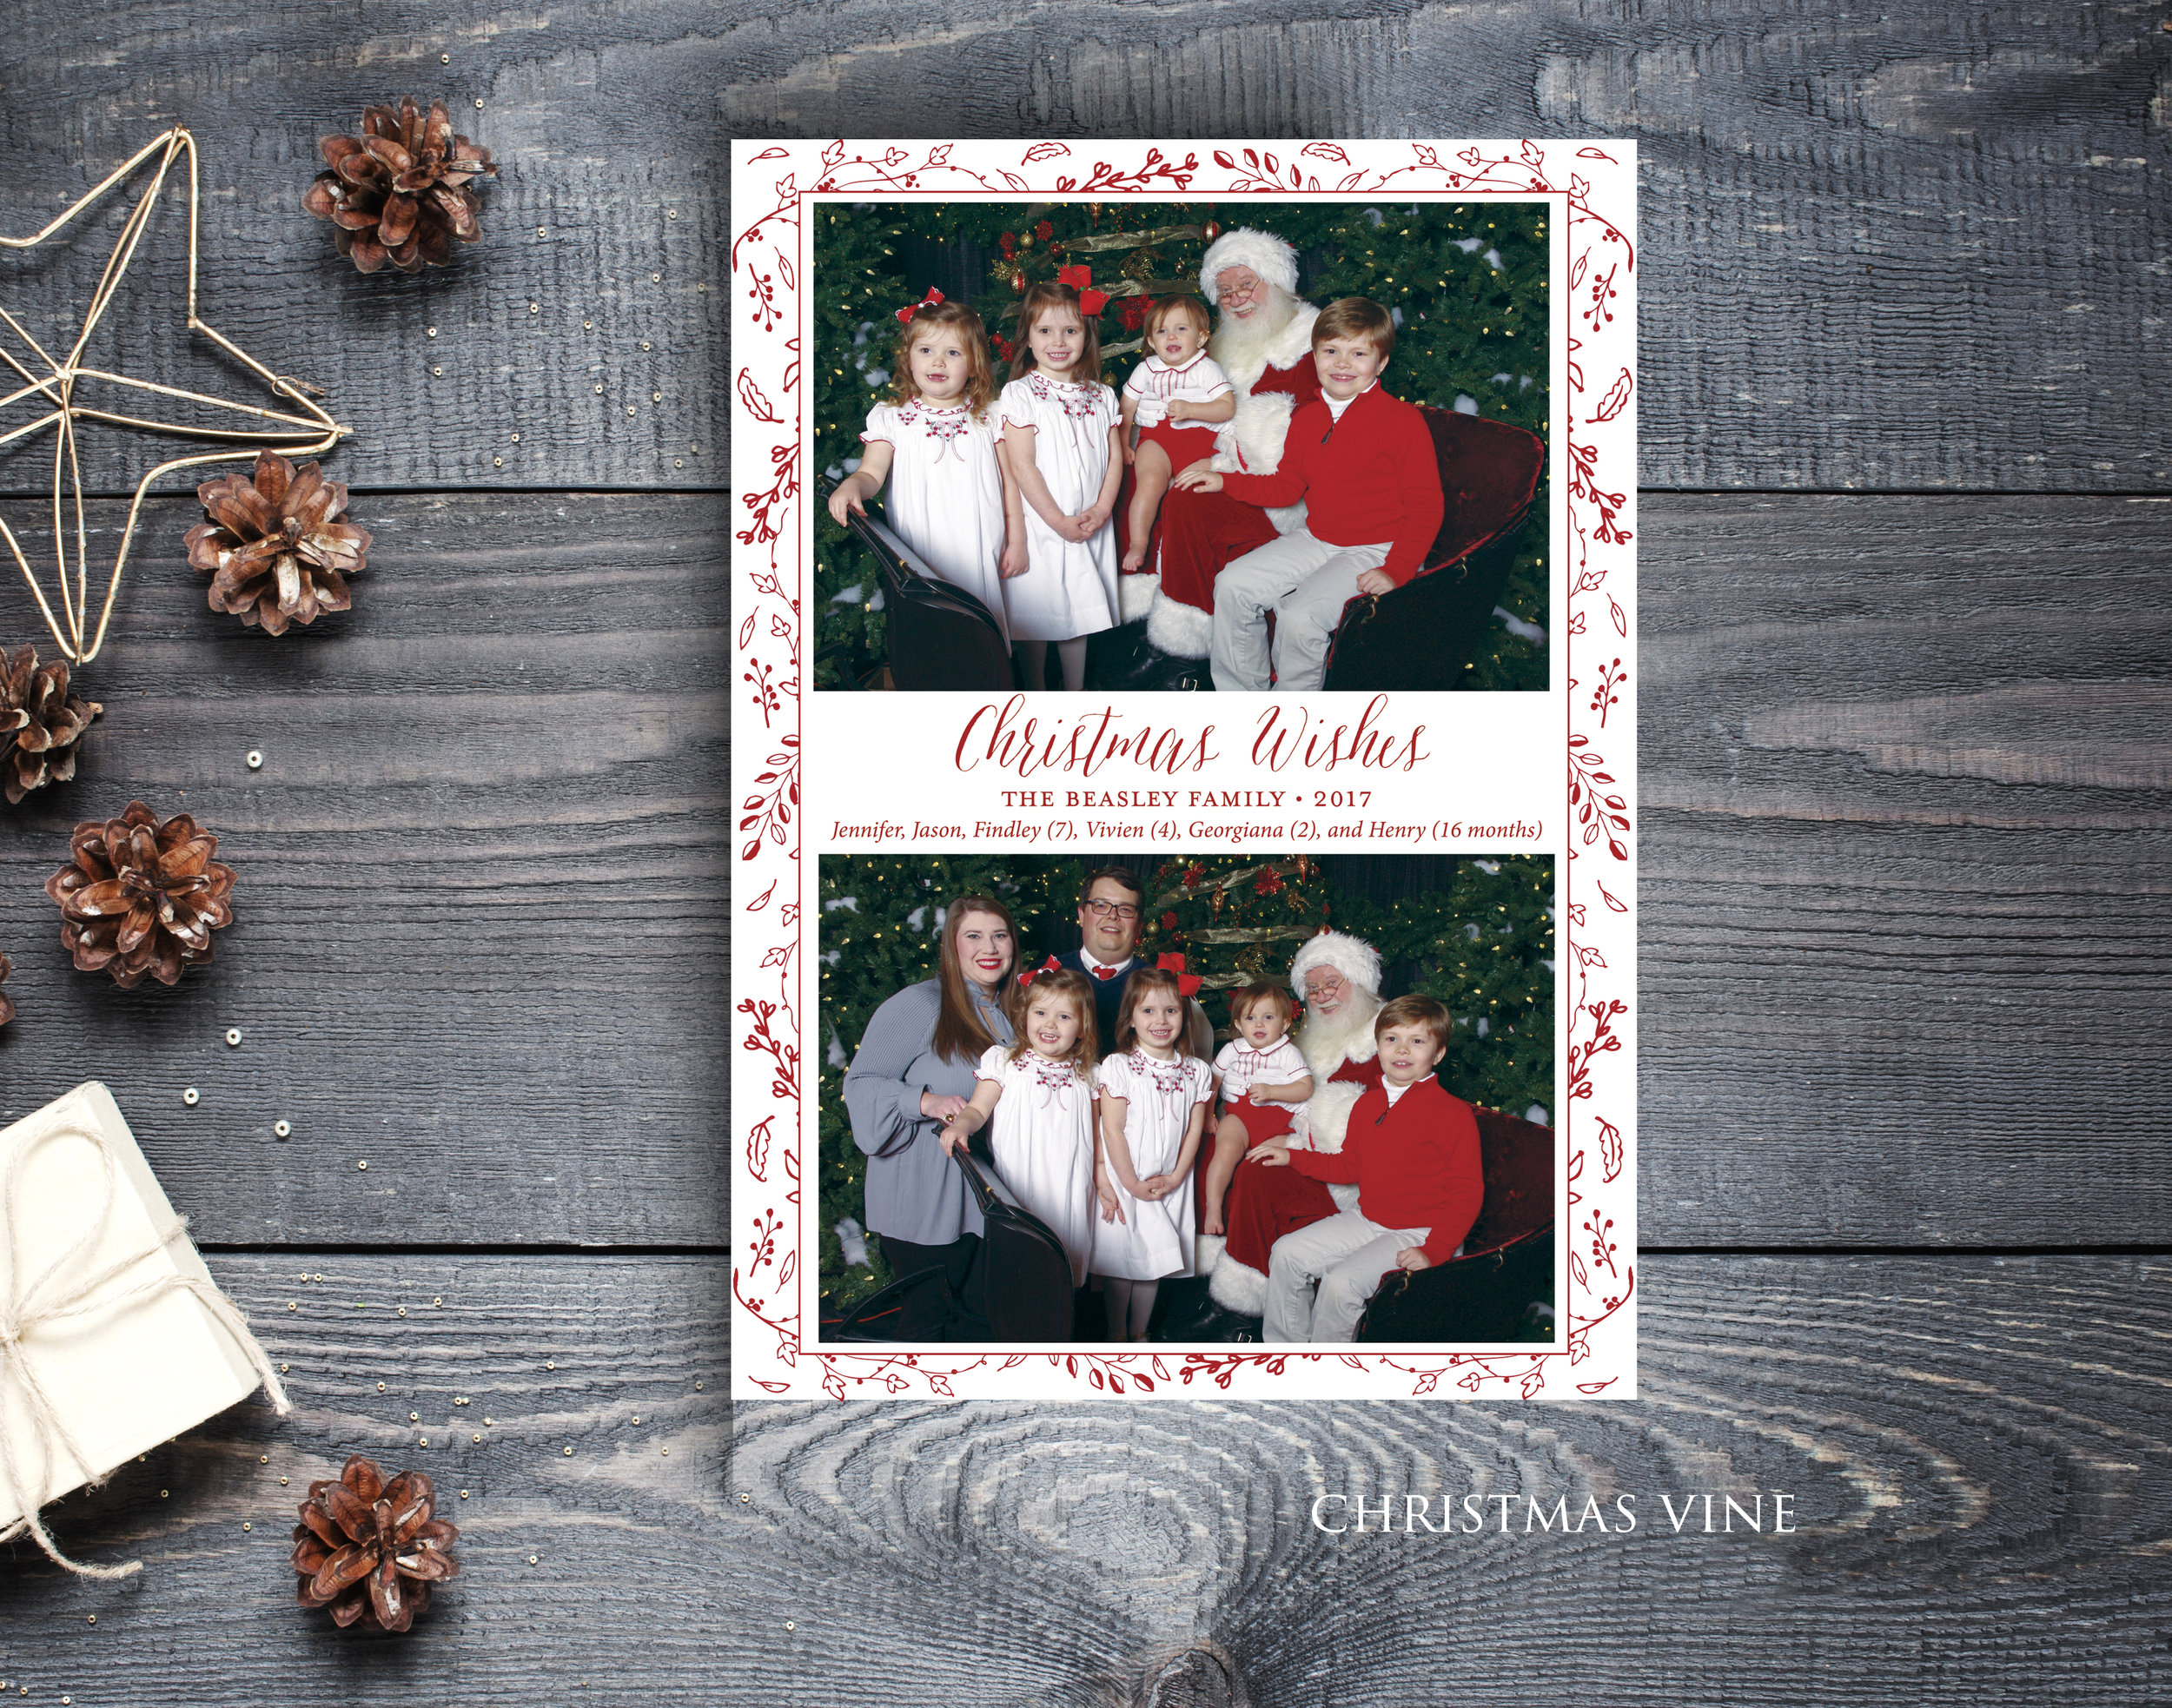 ChristmasVine.jpg